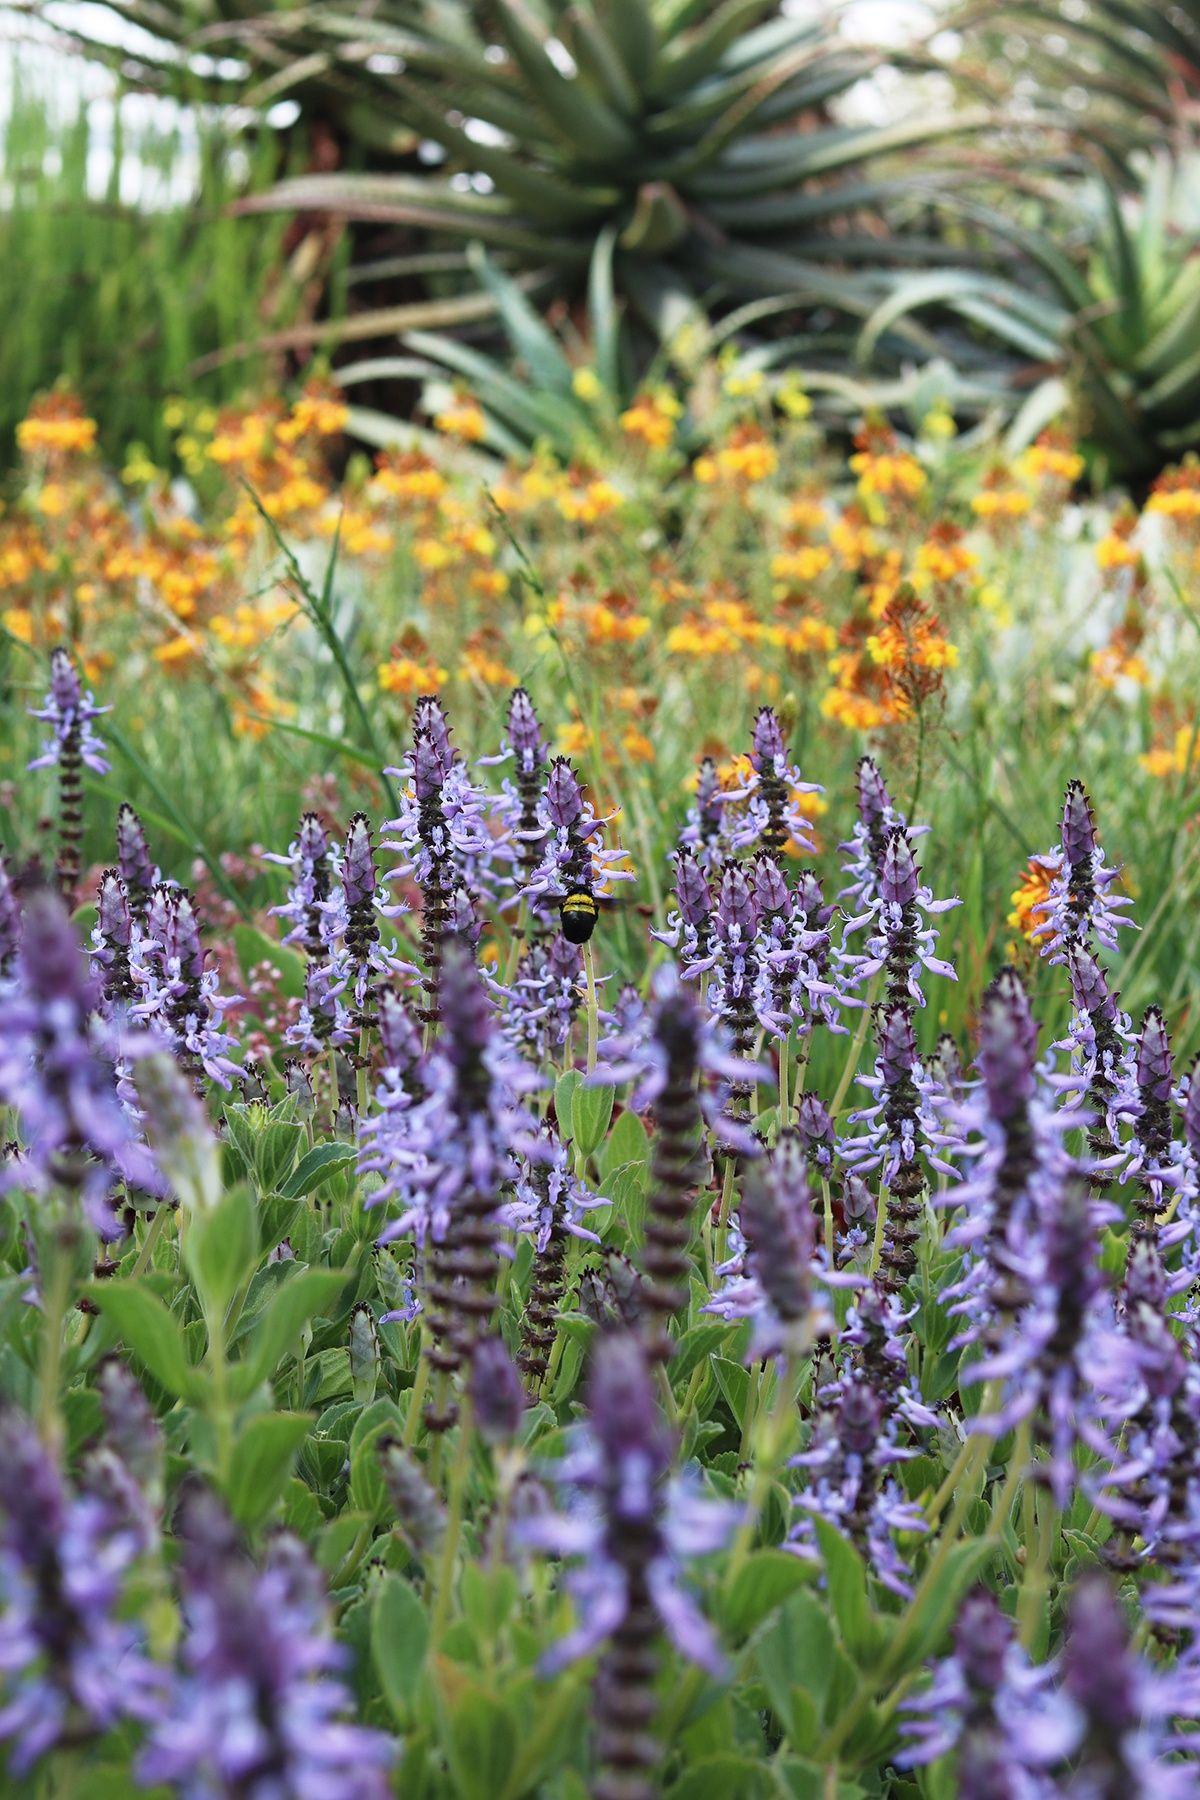 My Mother S Garden Summertime In South Africa Gardenista Garden Visits Small Yard Landscaping Waterwise Garden